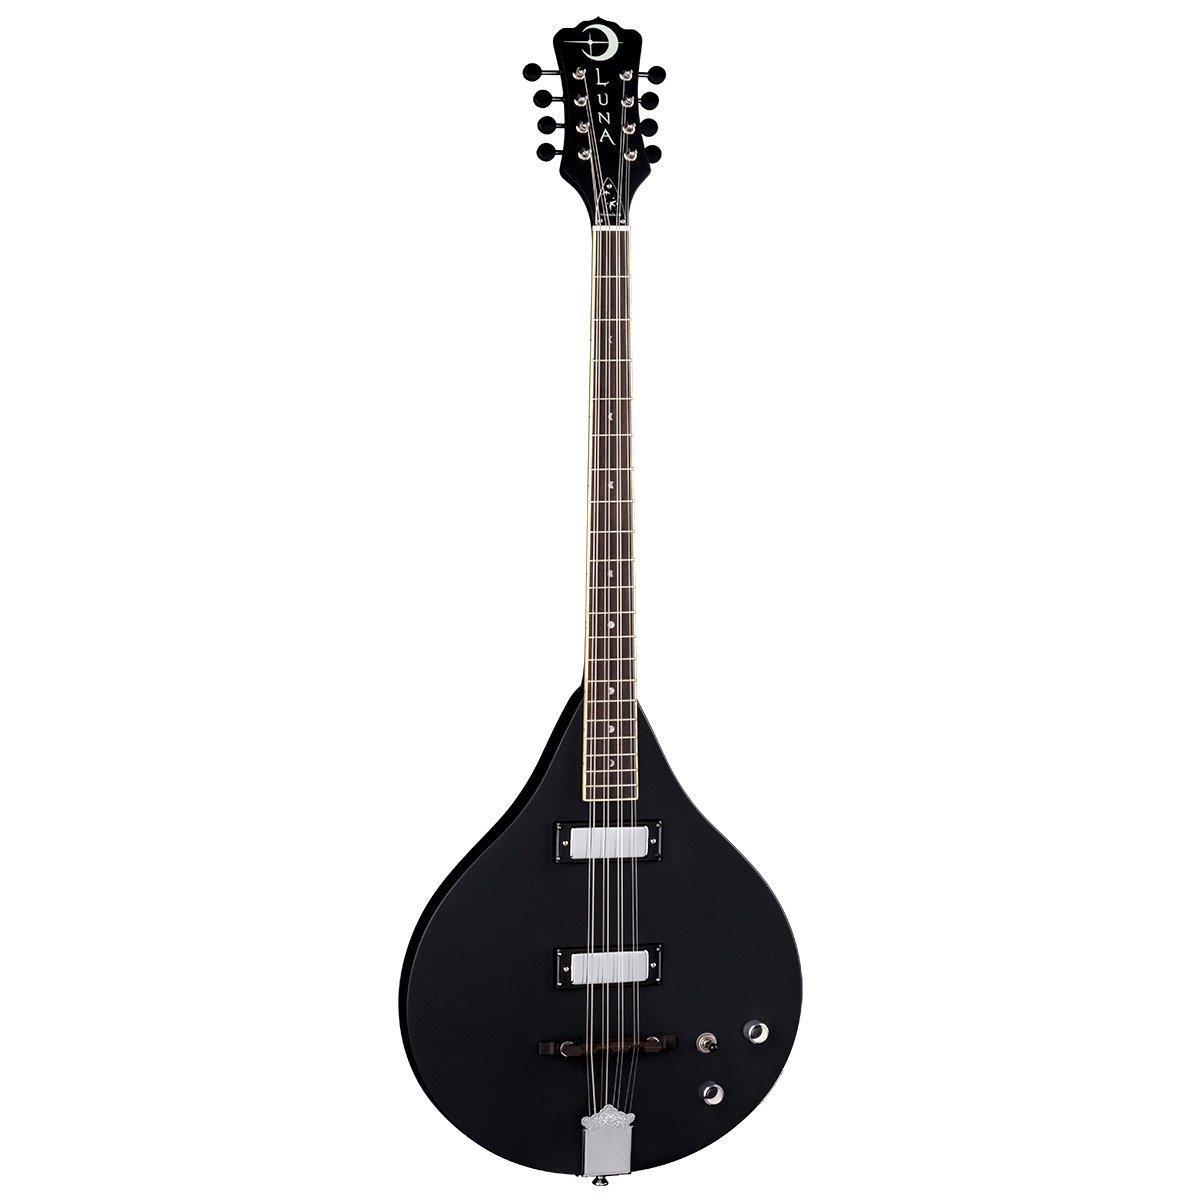 Luna Guitars Moonbird Series Solid 8-String Electric Bouzouki - Satin Black